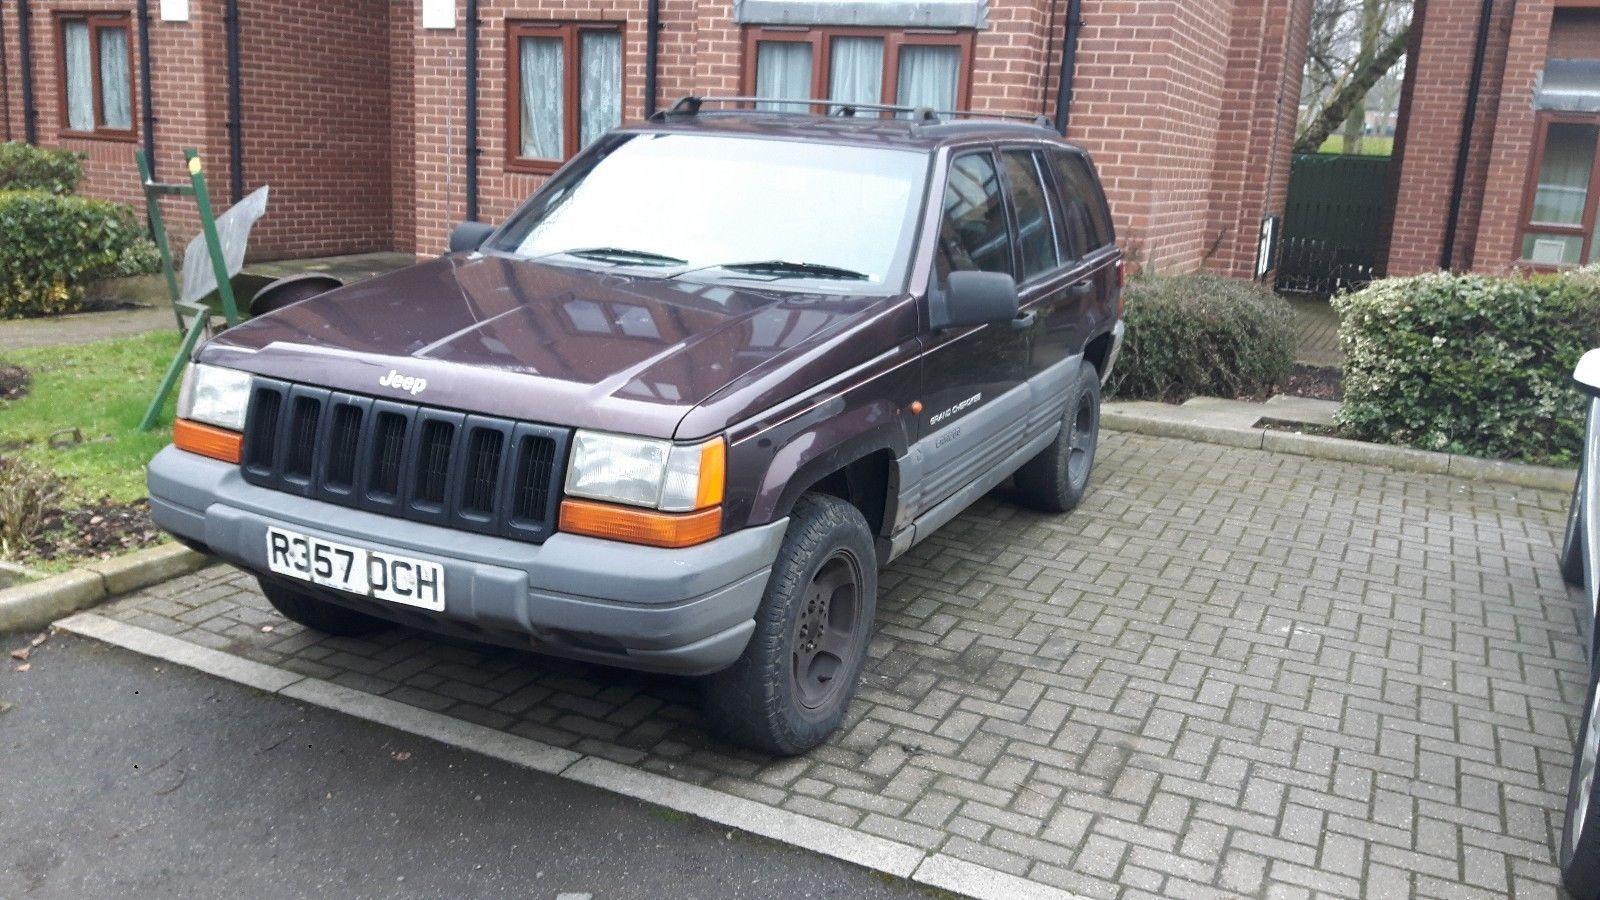 eBay: Jeep grand cherokee laredo ZJ 2.5 td manual. #jeep #jeeplife